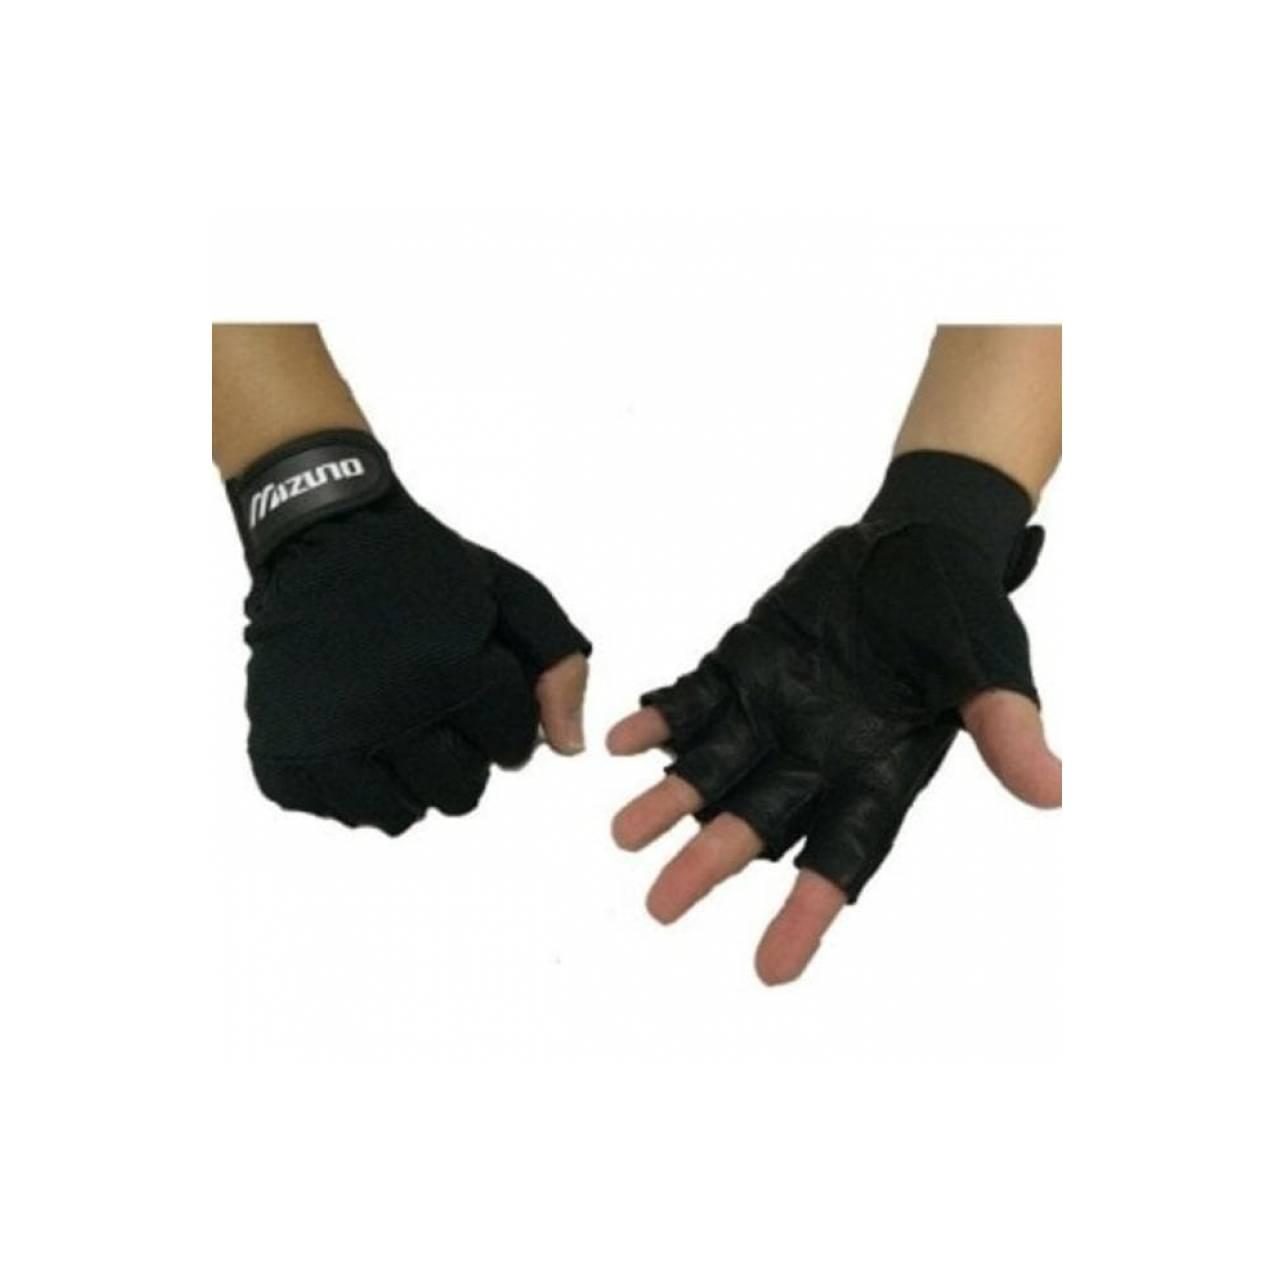 Romusha Tactical Glove Sarung Tangan Half Finger Airsoft Motor Inventzo Fargo Batok Rsm Source Sale Mizuno Gym